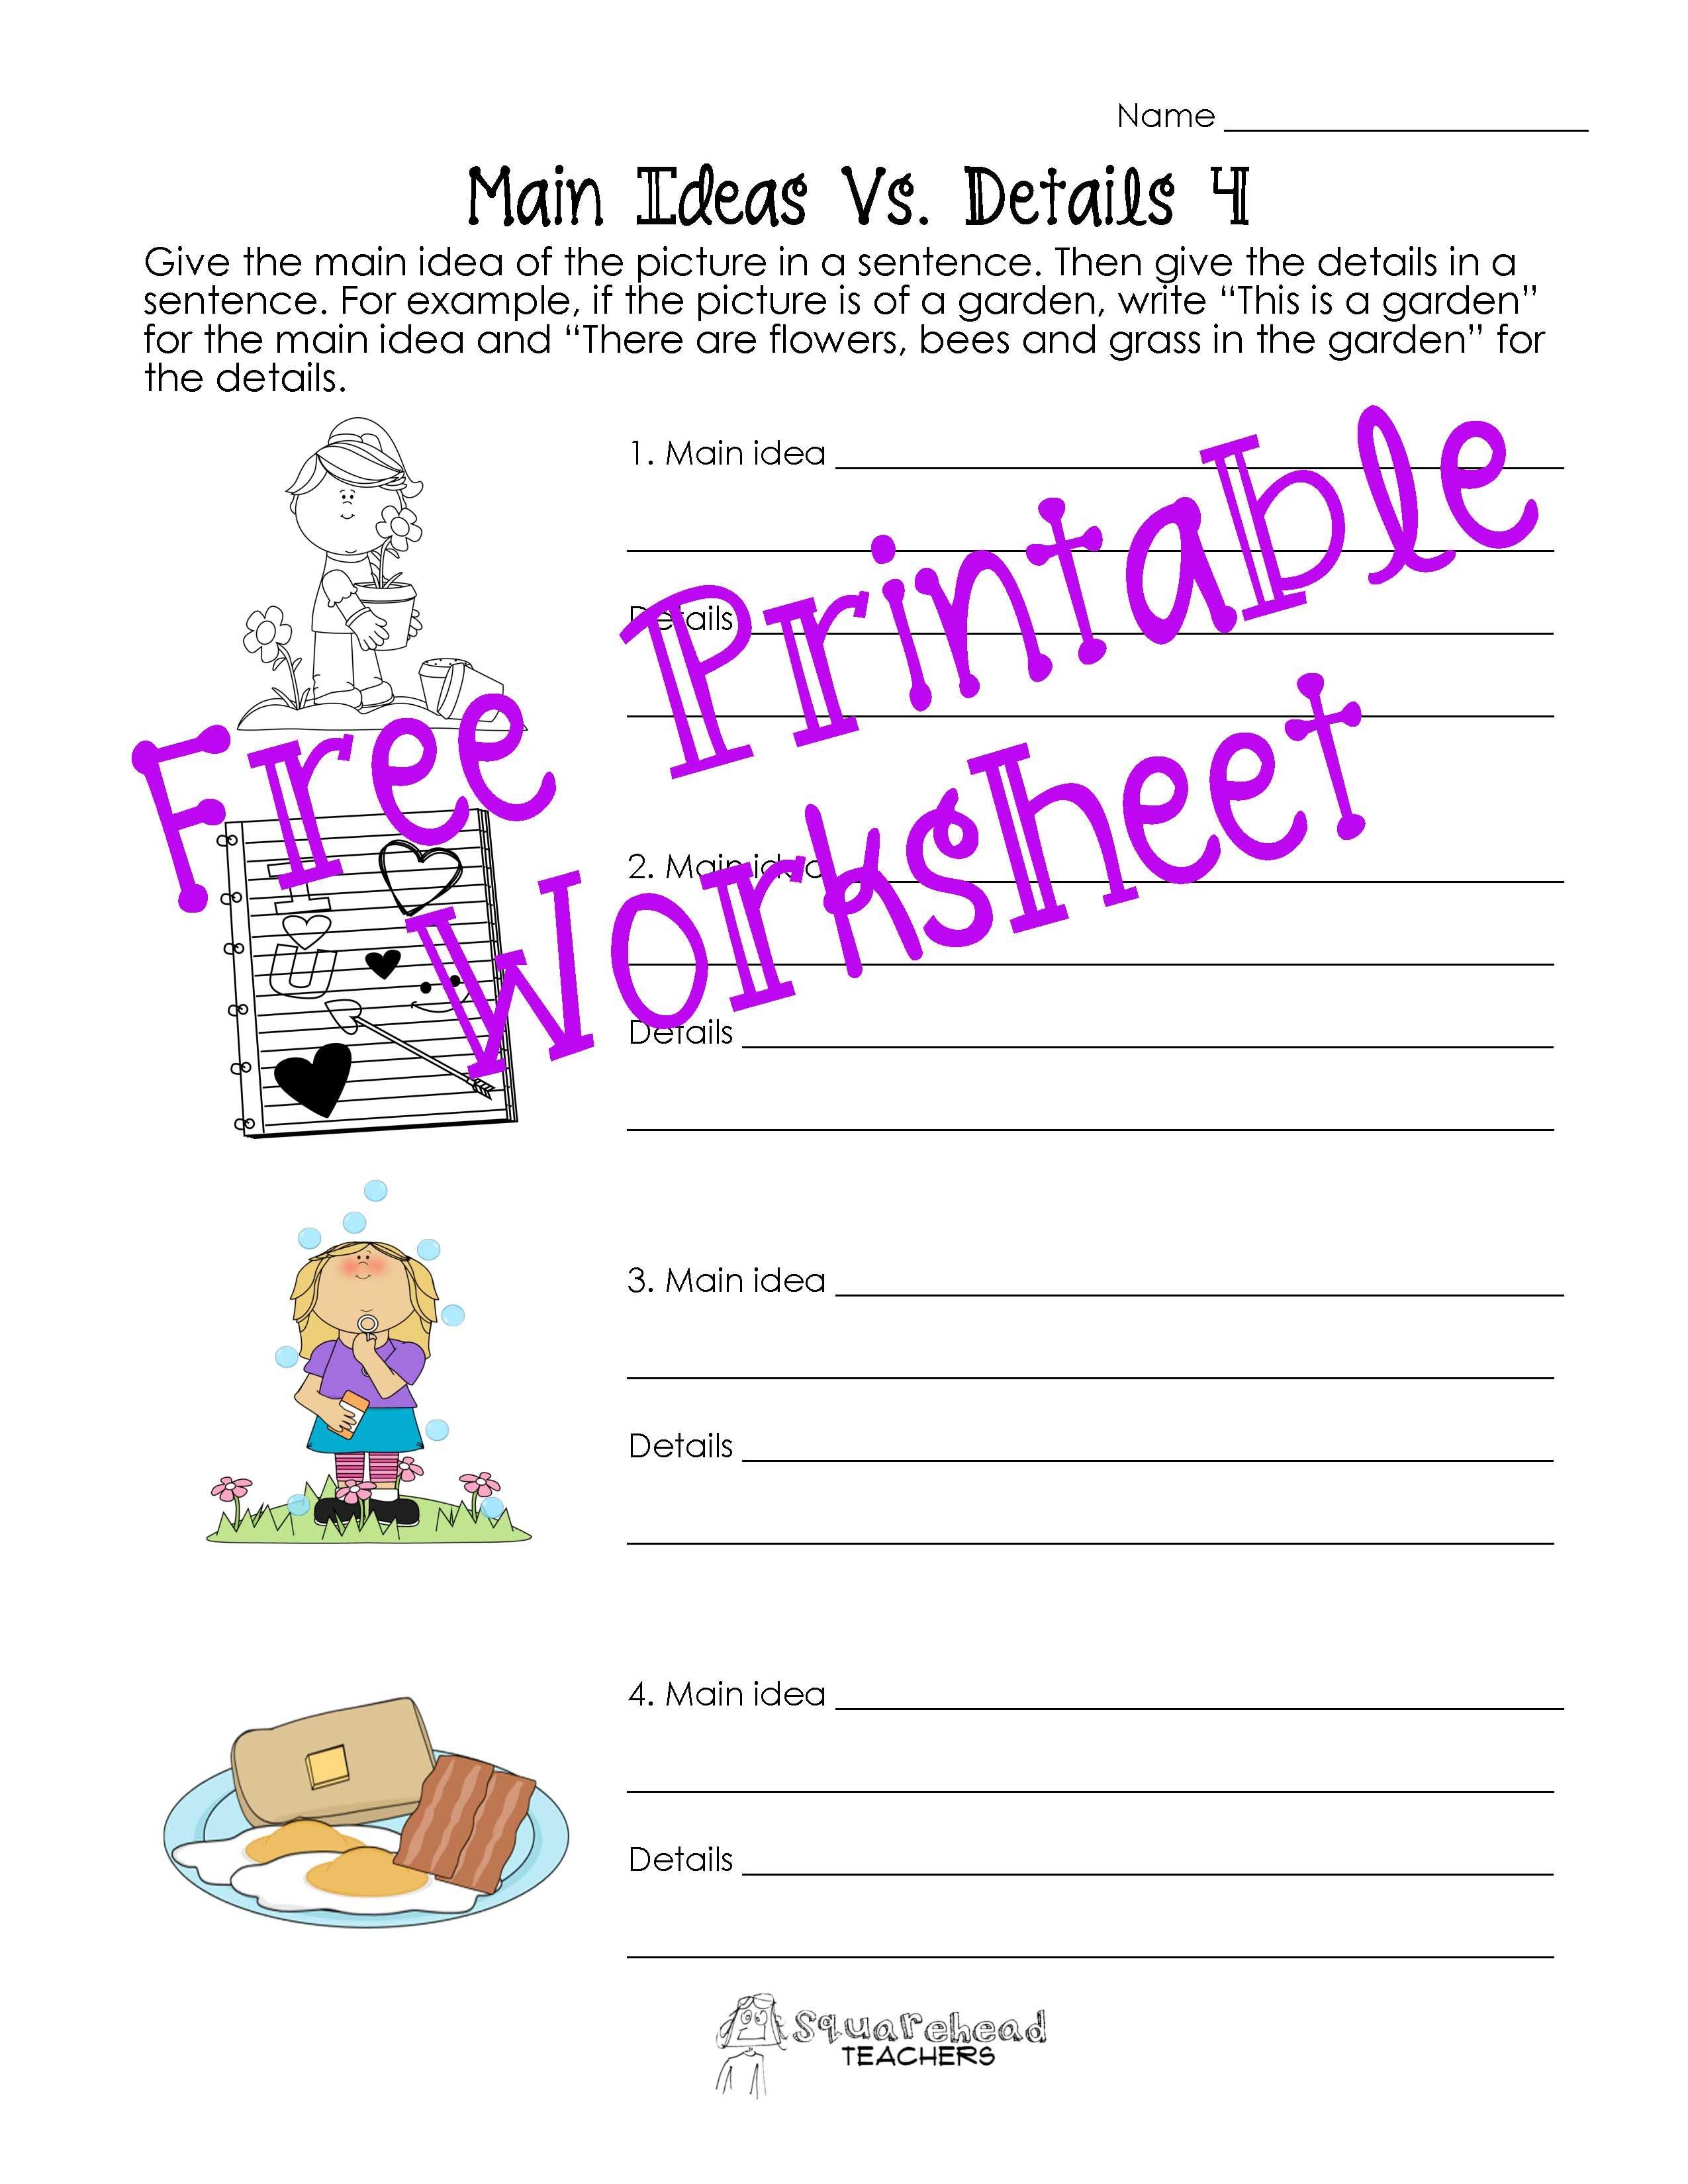 Main Idea Vs Details Worksheets Post 2  Squarehead Teachers Regarding Main Idea And Details Worksheets